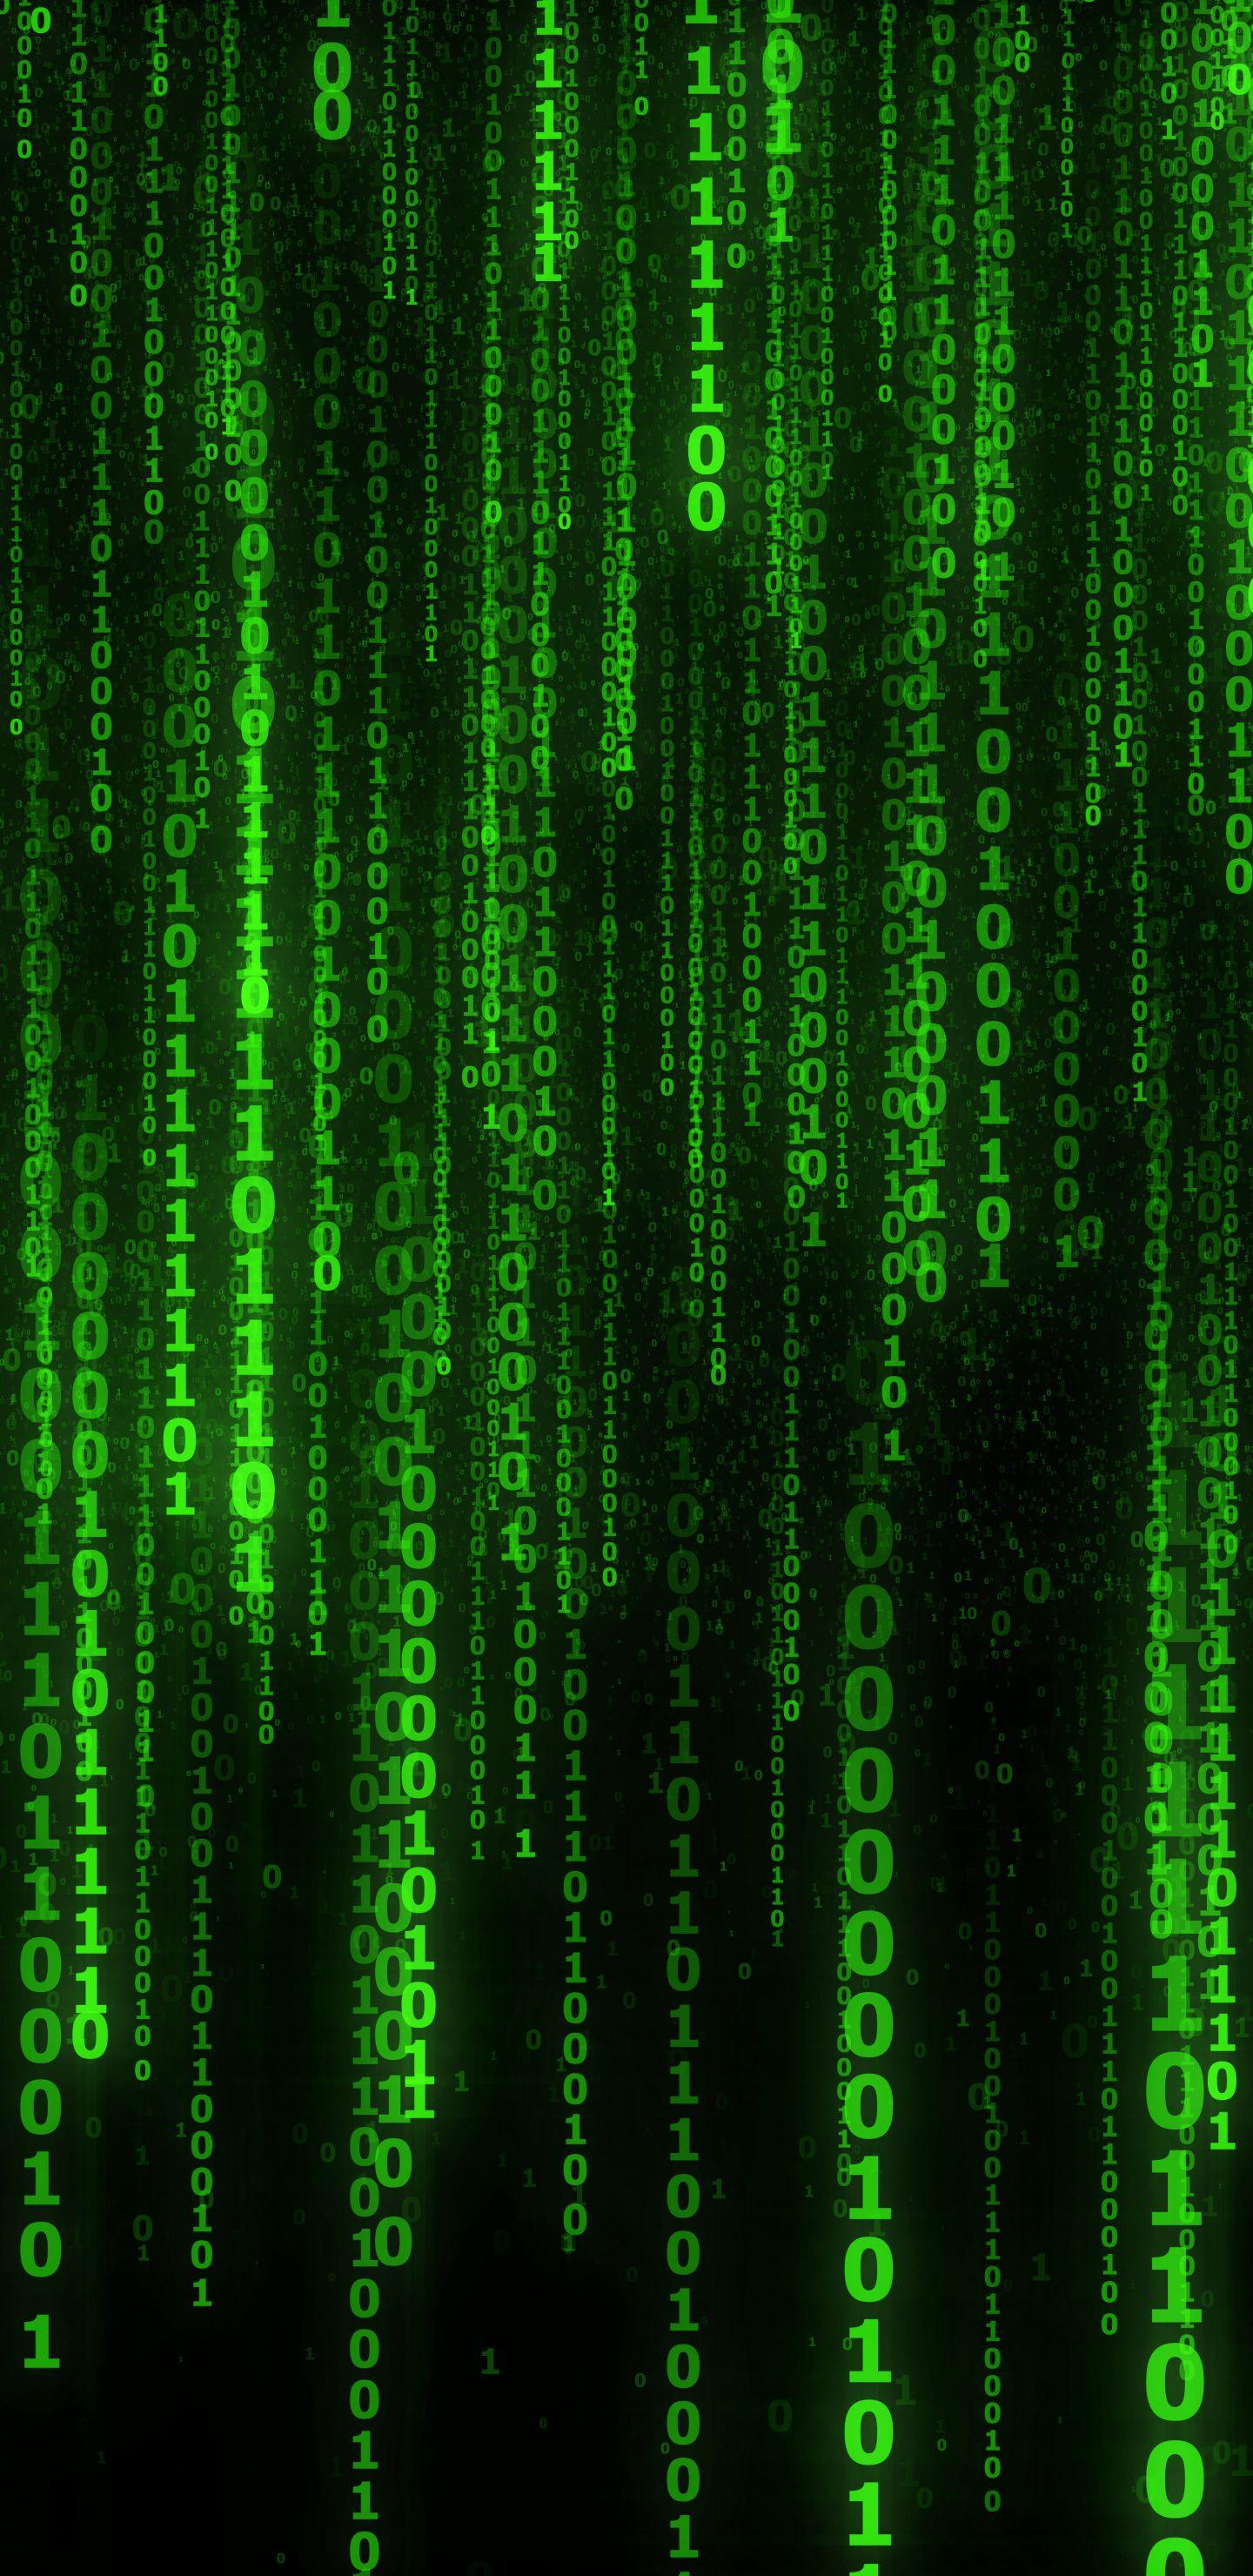 1440x2960 Matrix Code Numbers Green Wallpaper Green Wallpaper Phone Green Wallpaper Broken Screen Wallpaper